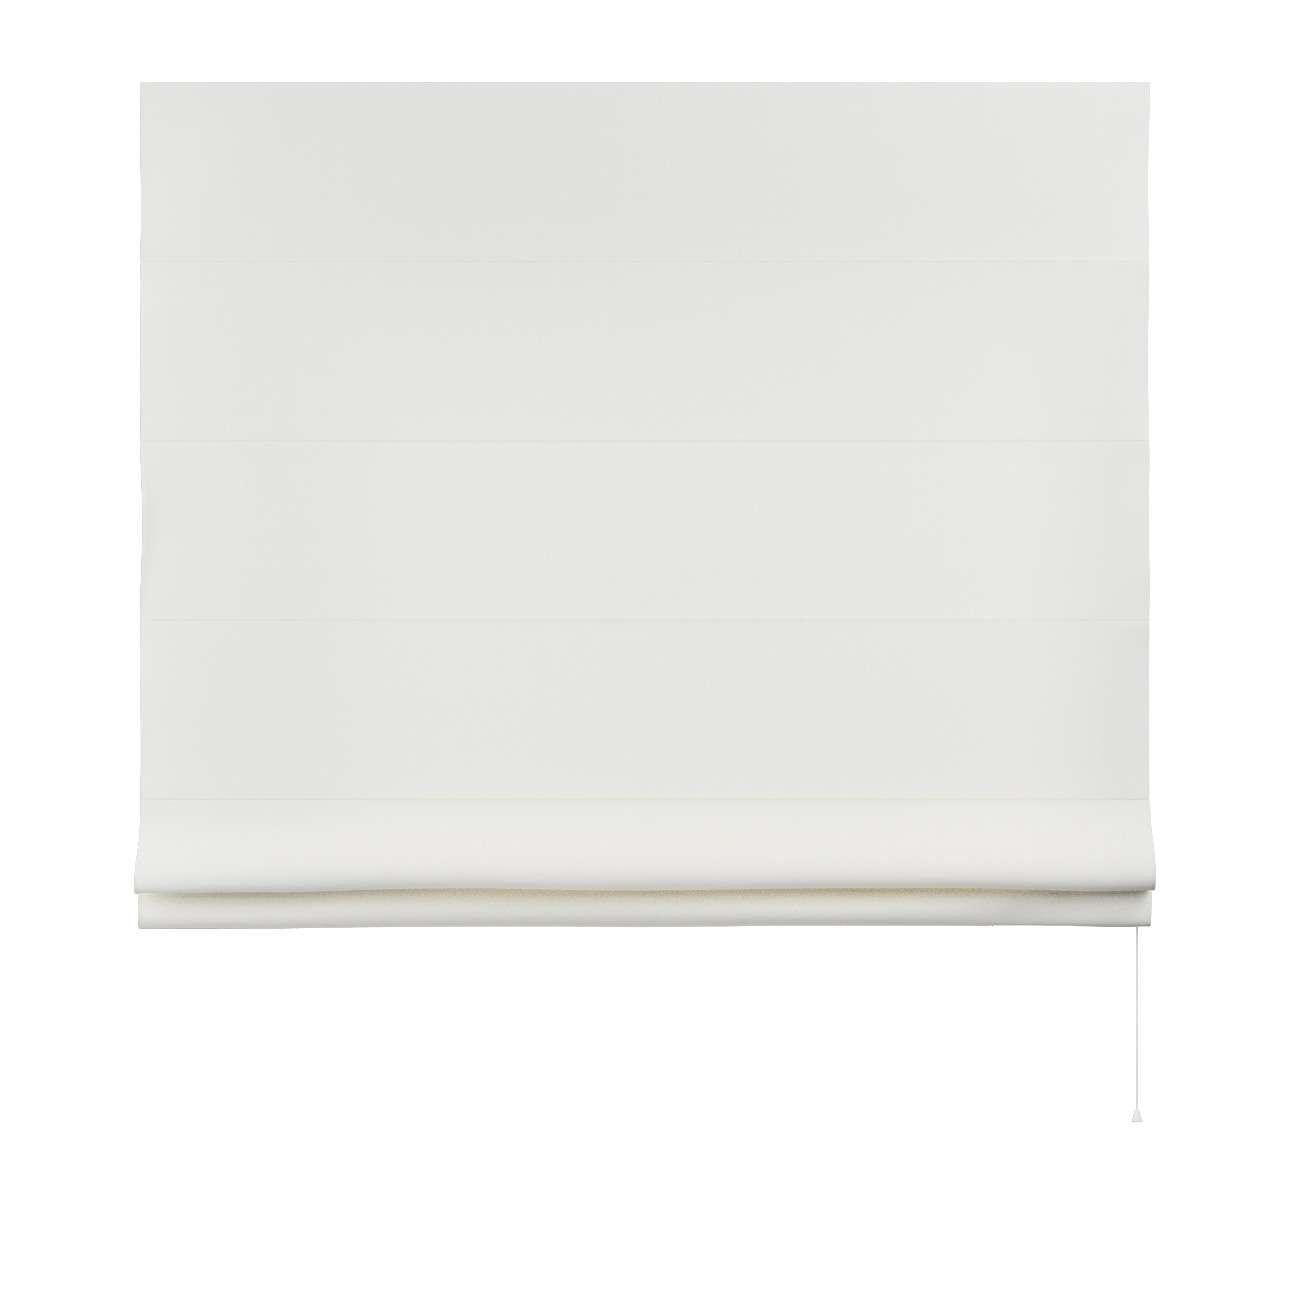 Vouwgordijn Capri 80 x 170 cm van de collectie Cotton Panama, Stof: 702-34